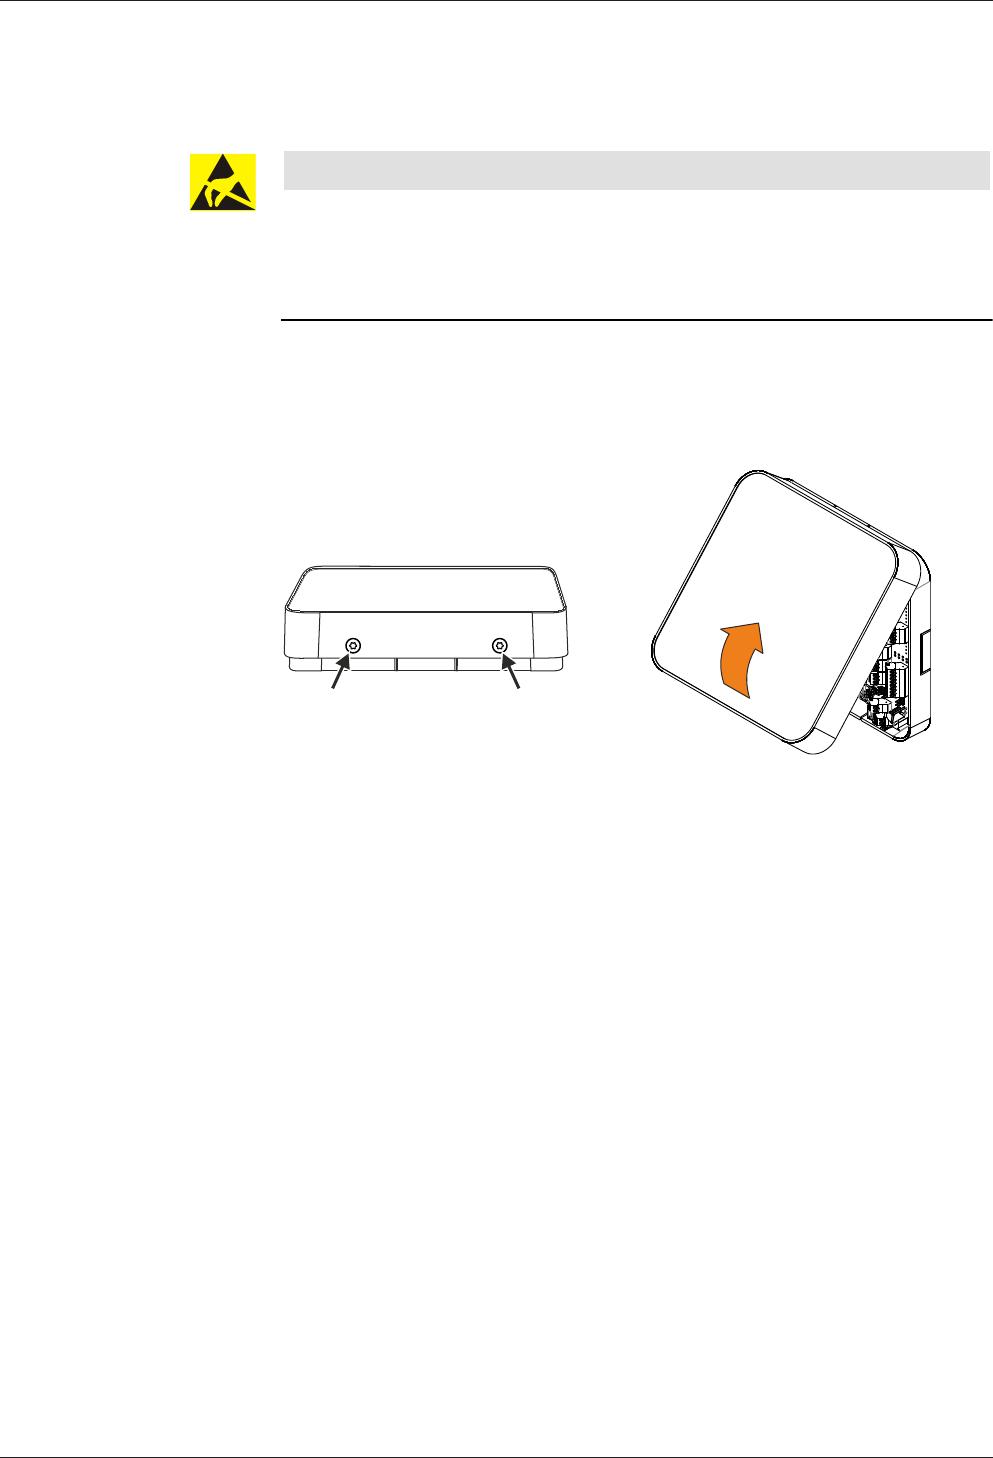 dormakaba EAD KAM9230-K5 RFID Reader User Manual TM 9230